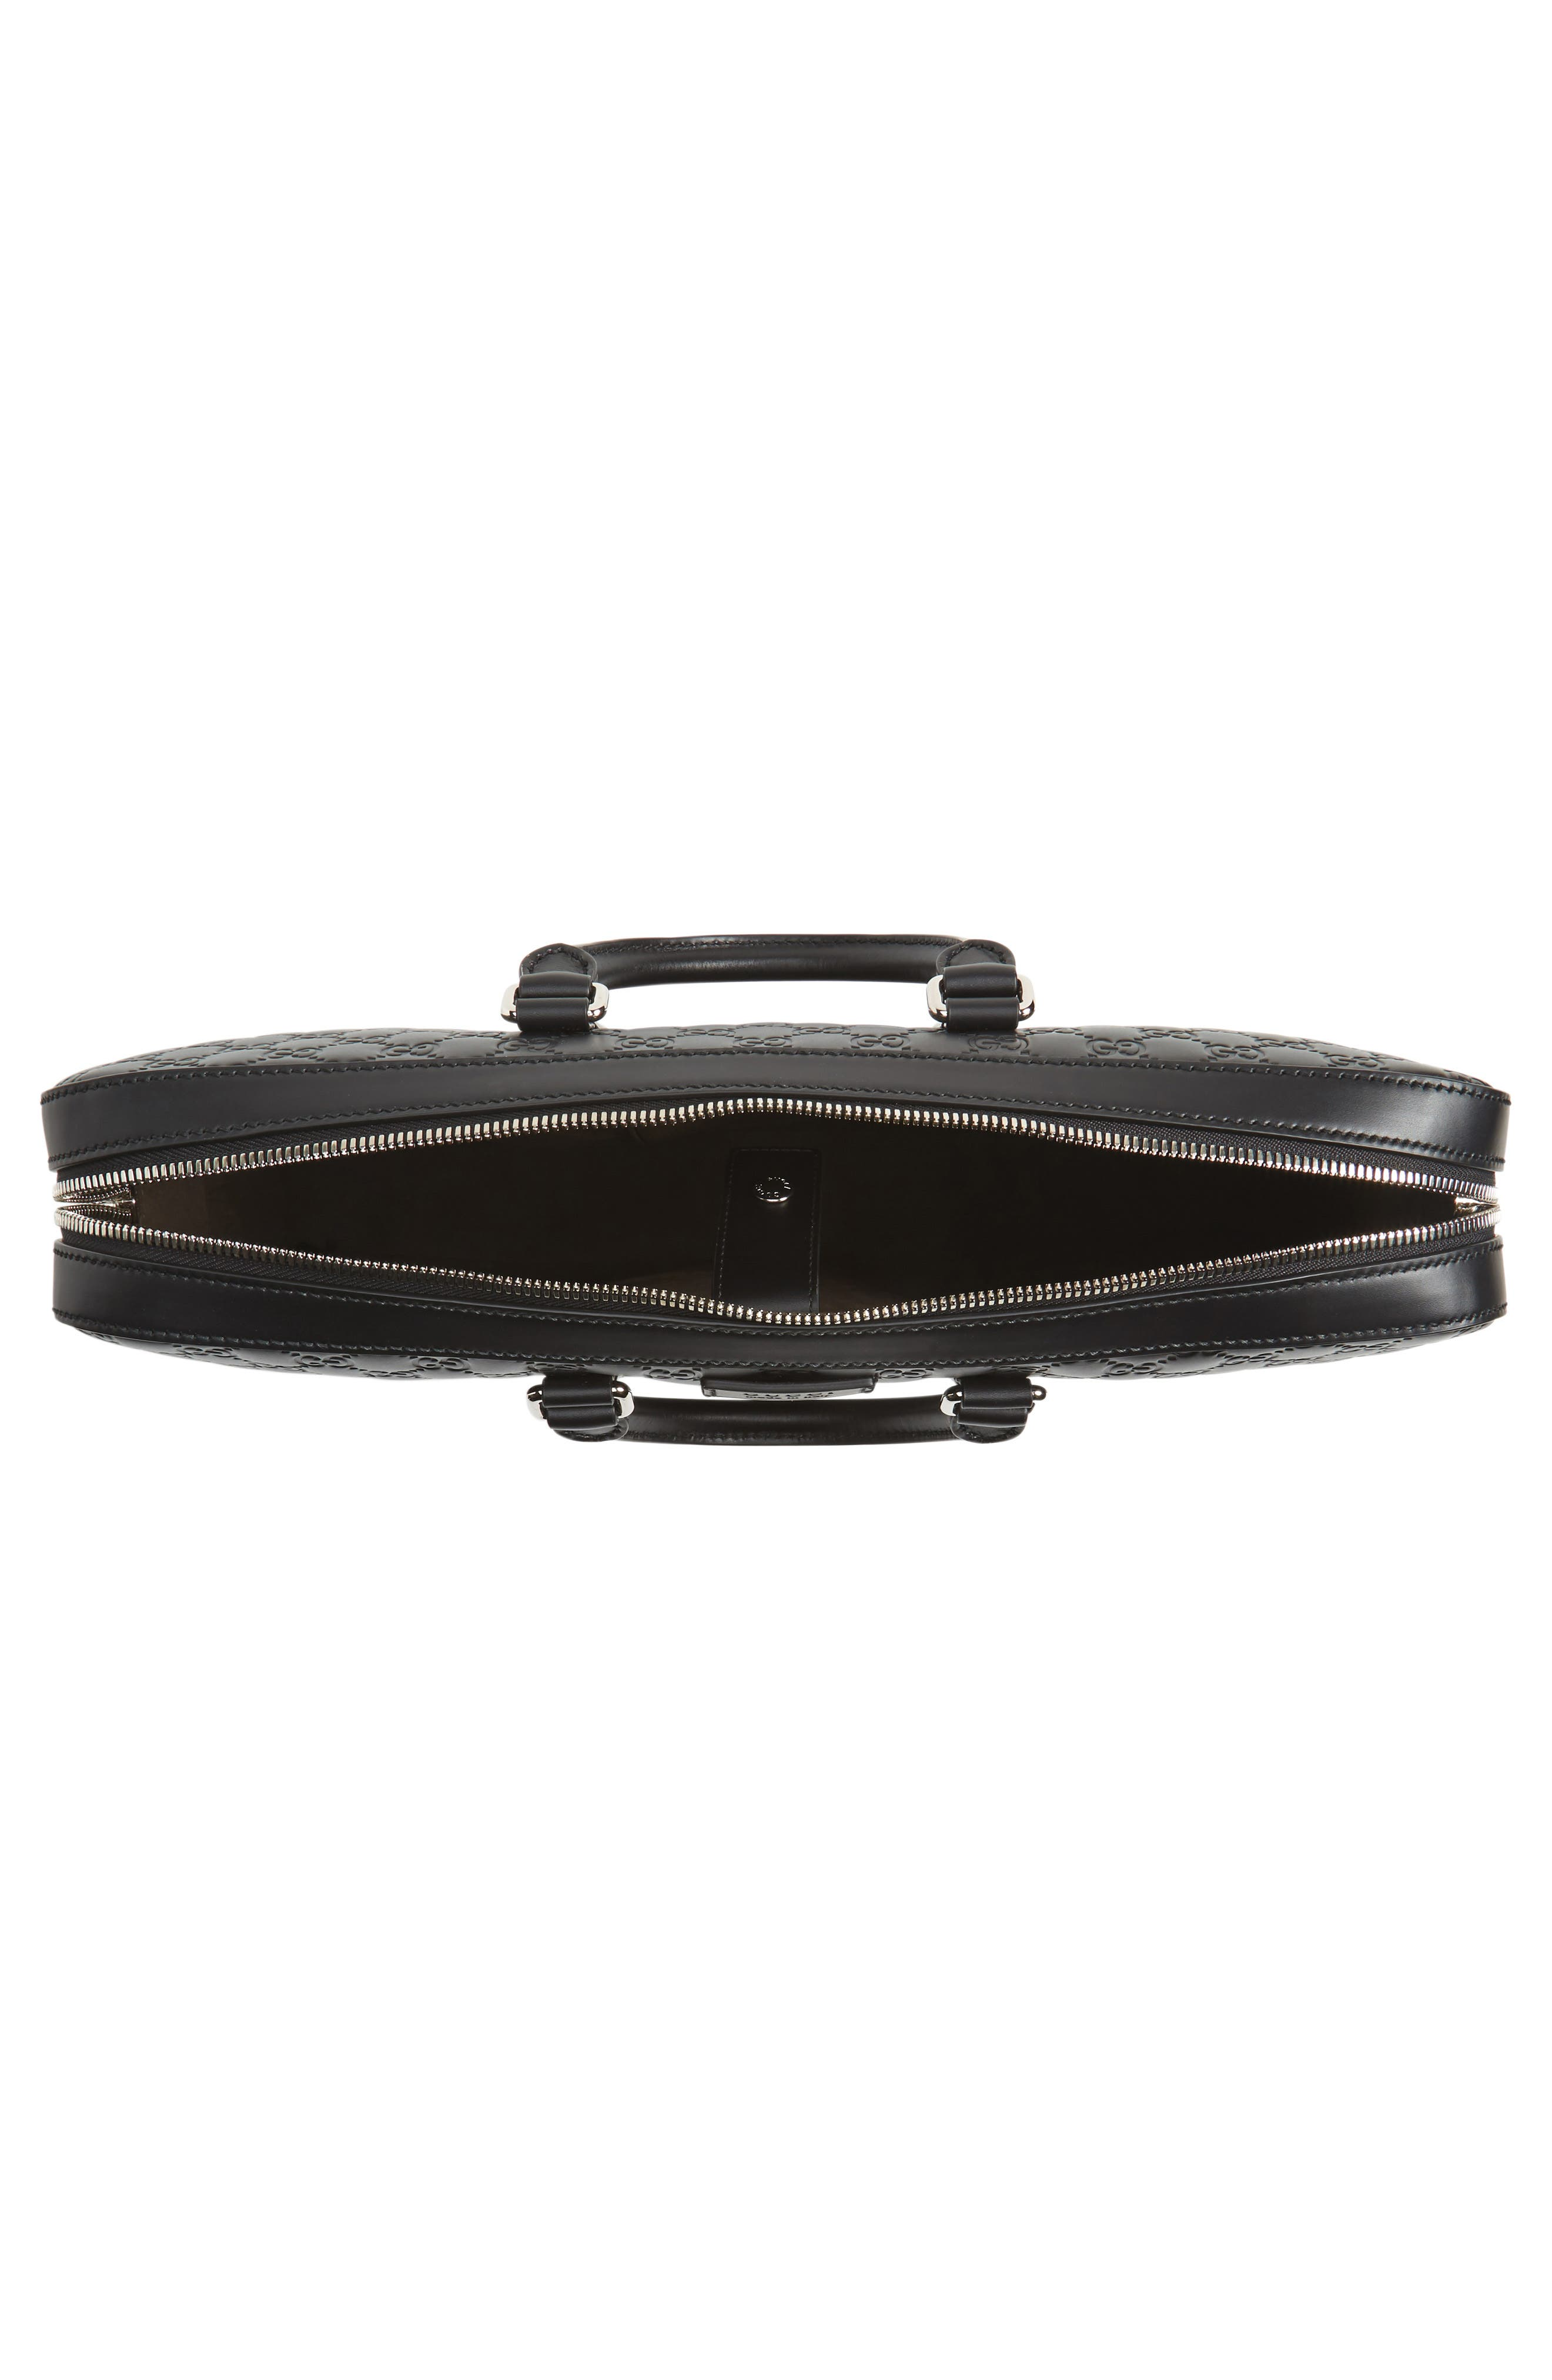 Signature Leather Briefcase,                             Alternate thumbnail 4, color,                             001